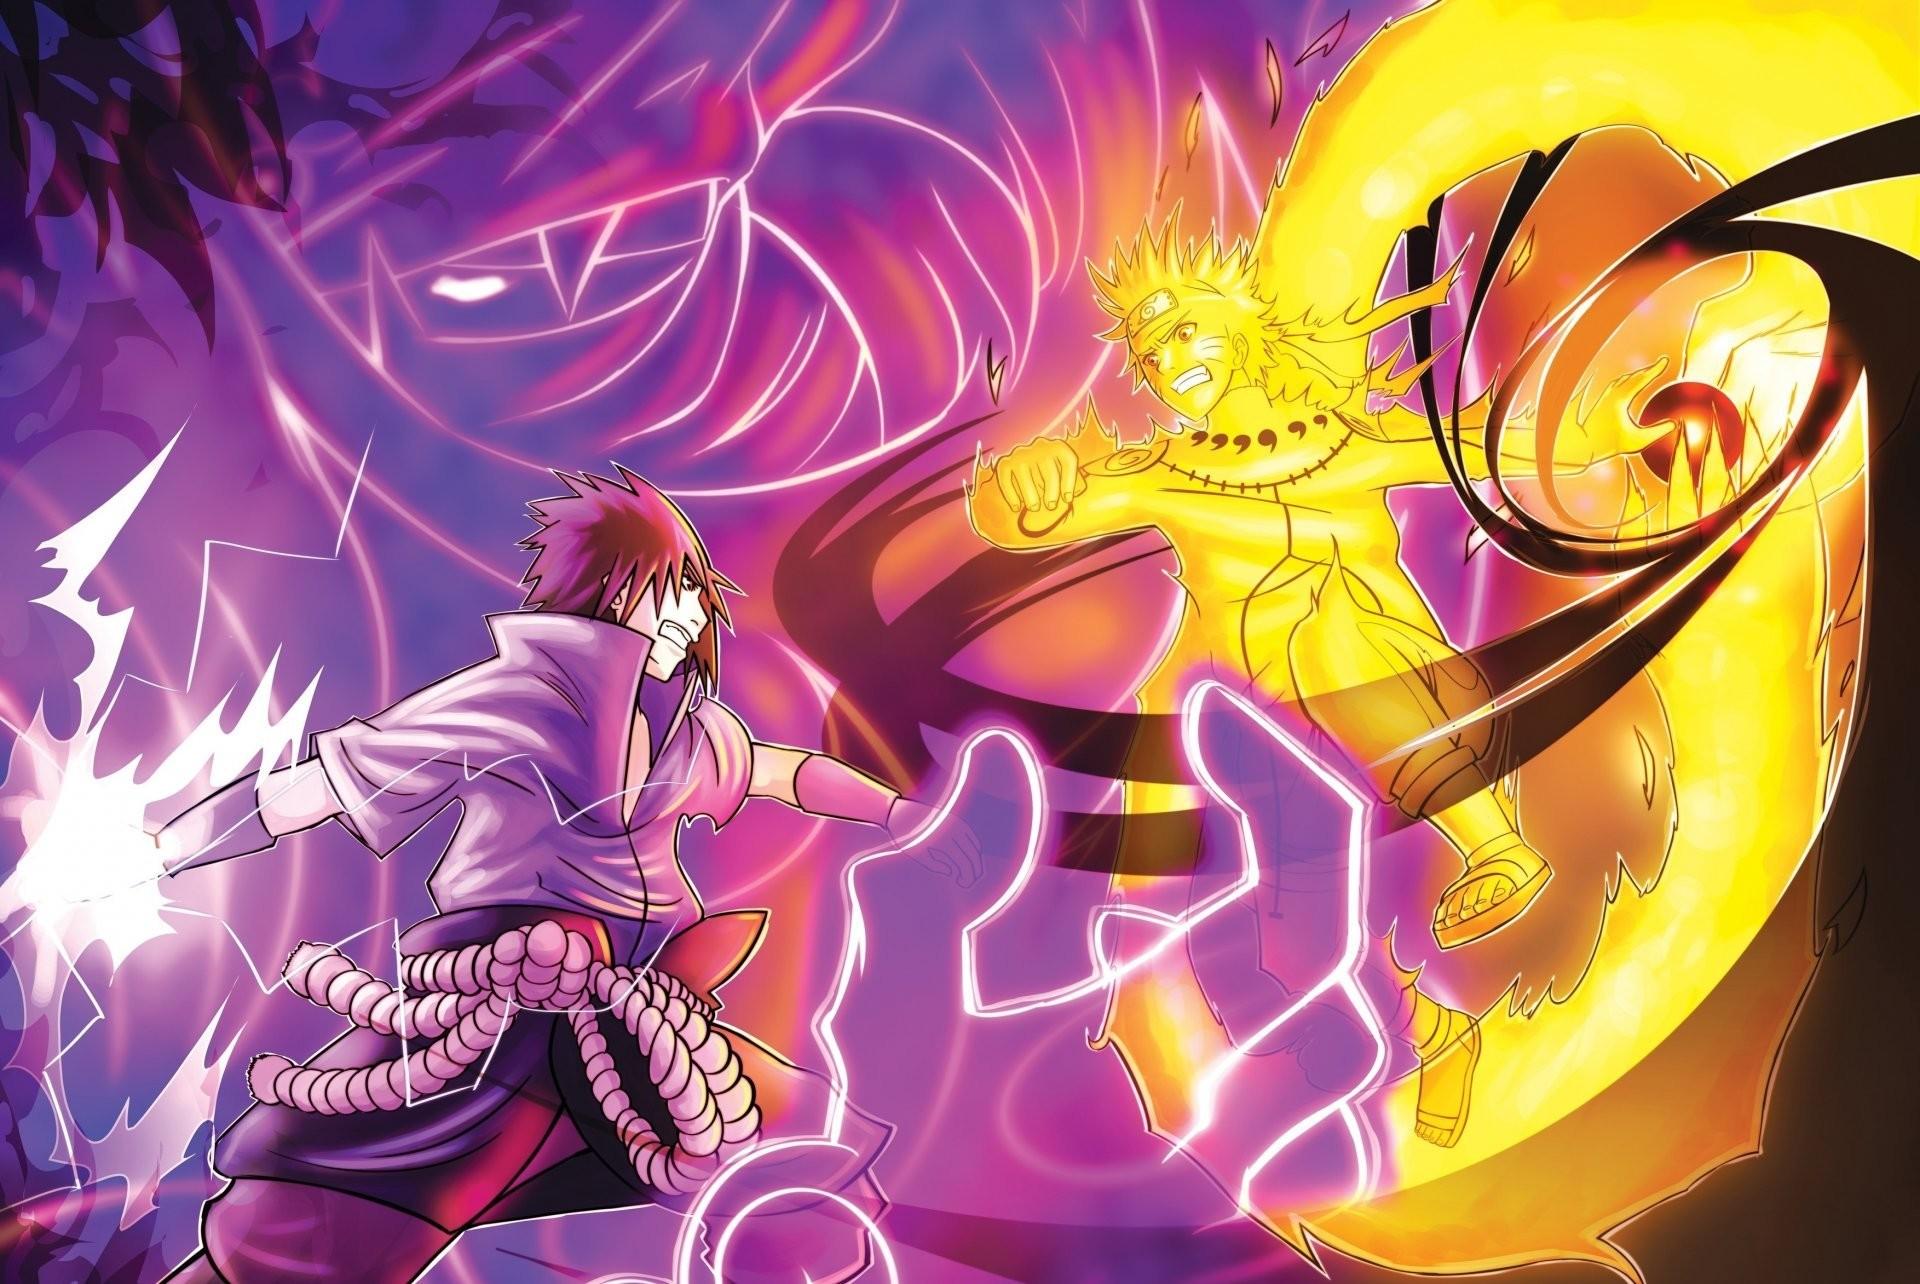 Sasuke Susanoo Wallpaper (67+ images)